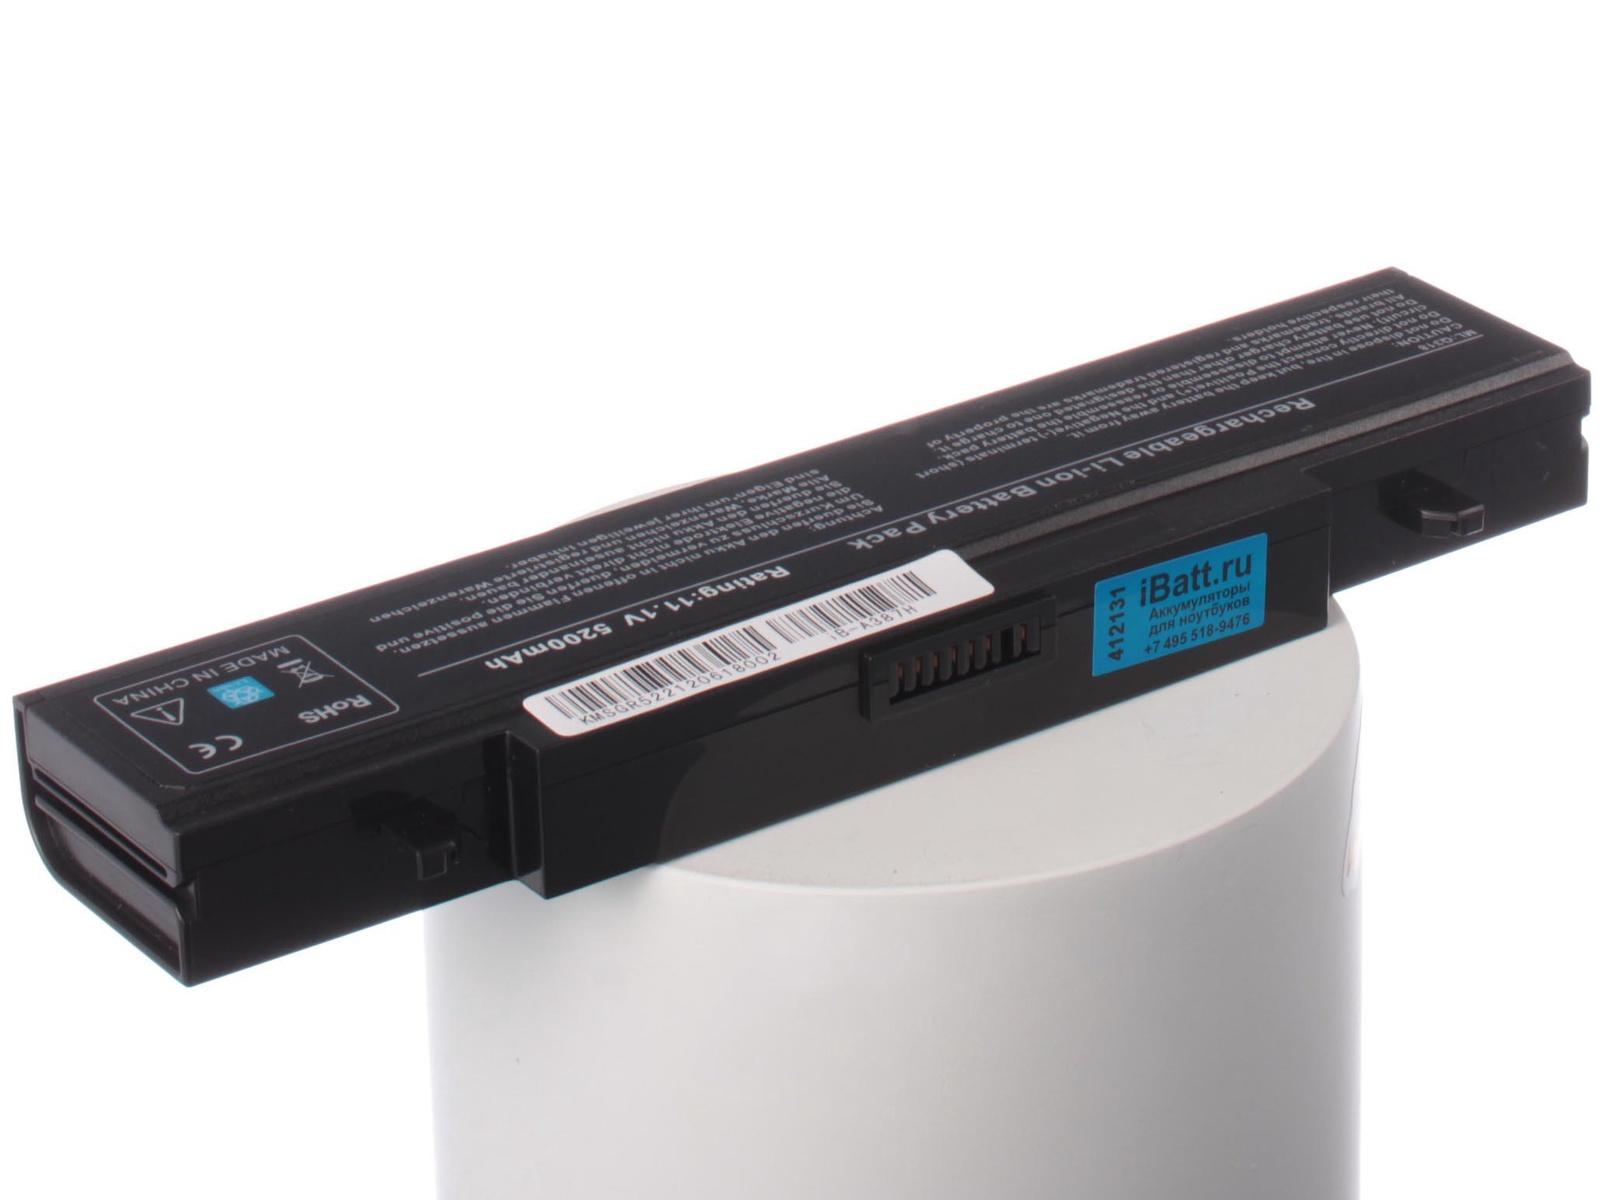 цена Аккумулятор для ноутбука iBatt Samsung AA-PB9NC6B, AA-PB9NS6B, AA-PB9NC6W, AA-PB9NC5B, AA-PB9NS6W, AA-PL9NC6W, AA-PL9NC2B, AA-PL9NC6B, CS-SNC318HB, CS-SNC318NB онлайн в 2017 году